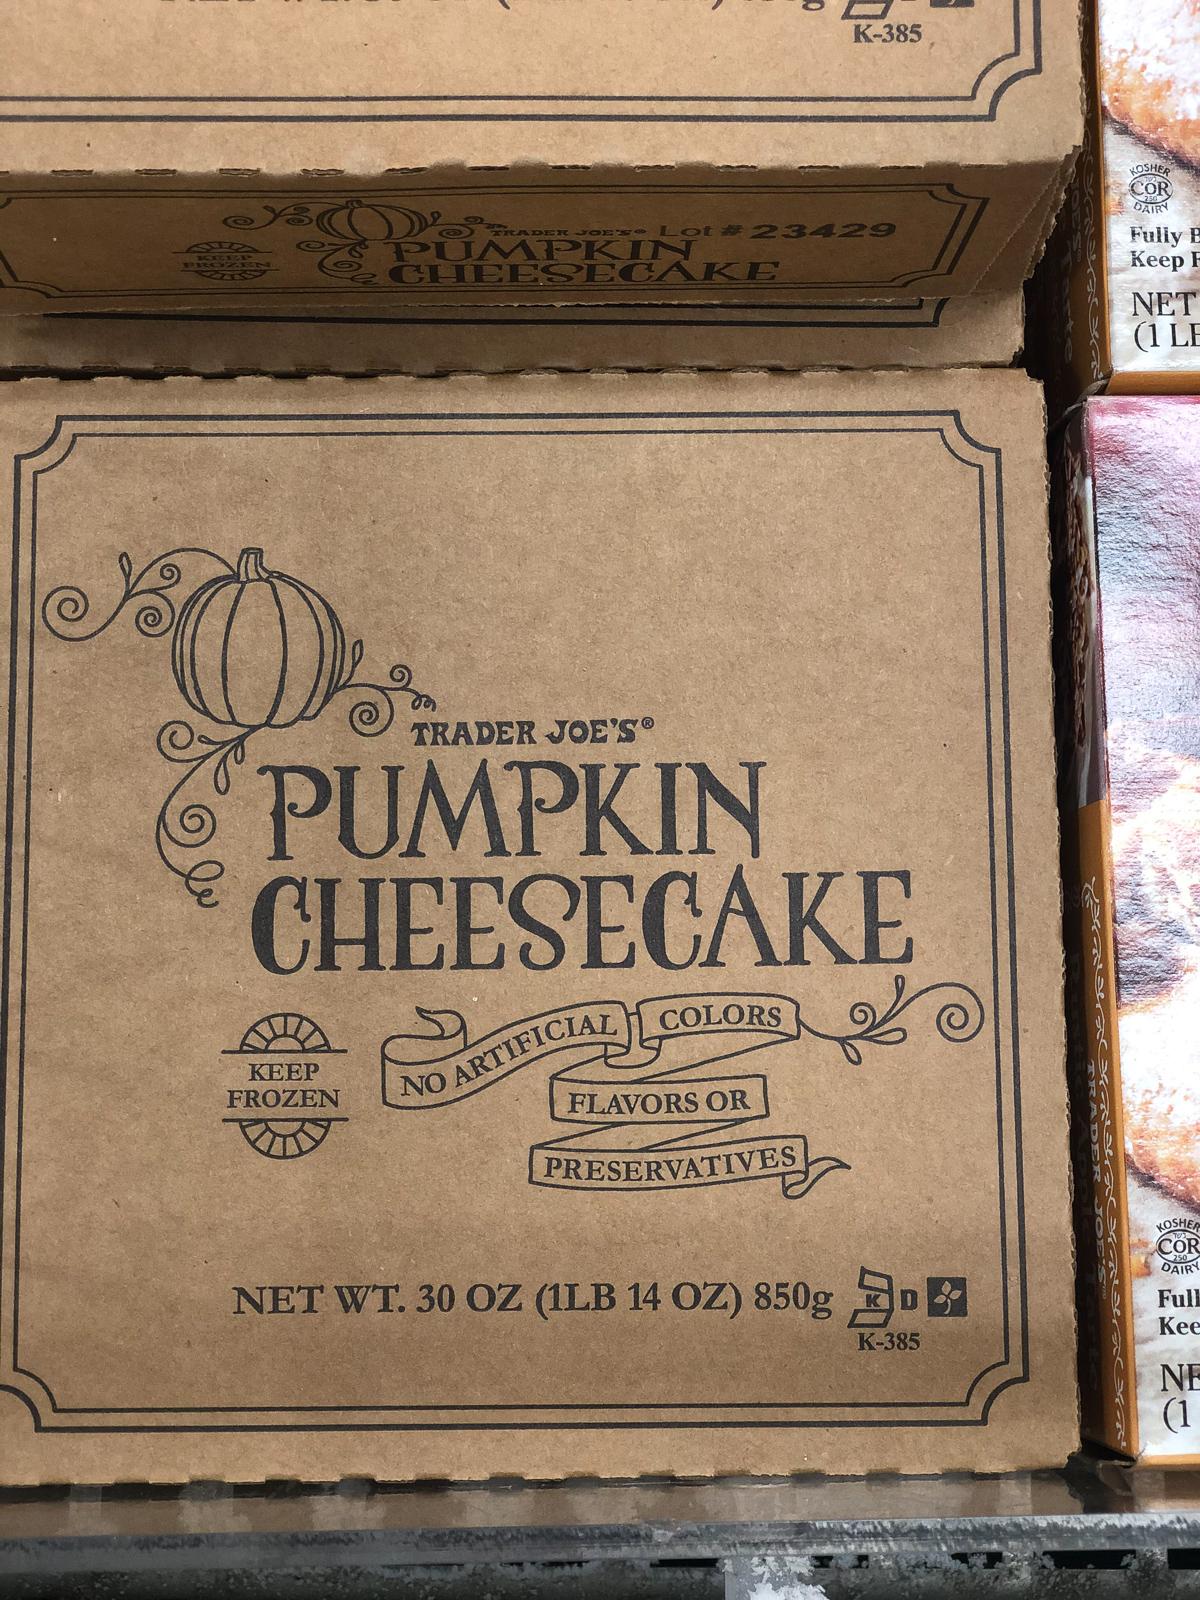 50+ Trader Joe's Pumpkin Favorites and Fall Eats - Pumpkin Cheesecake